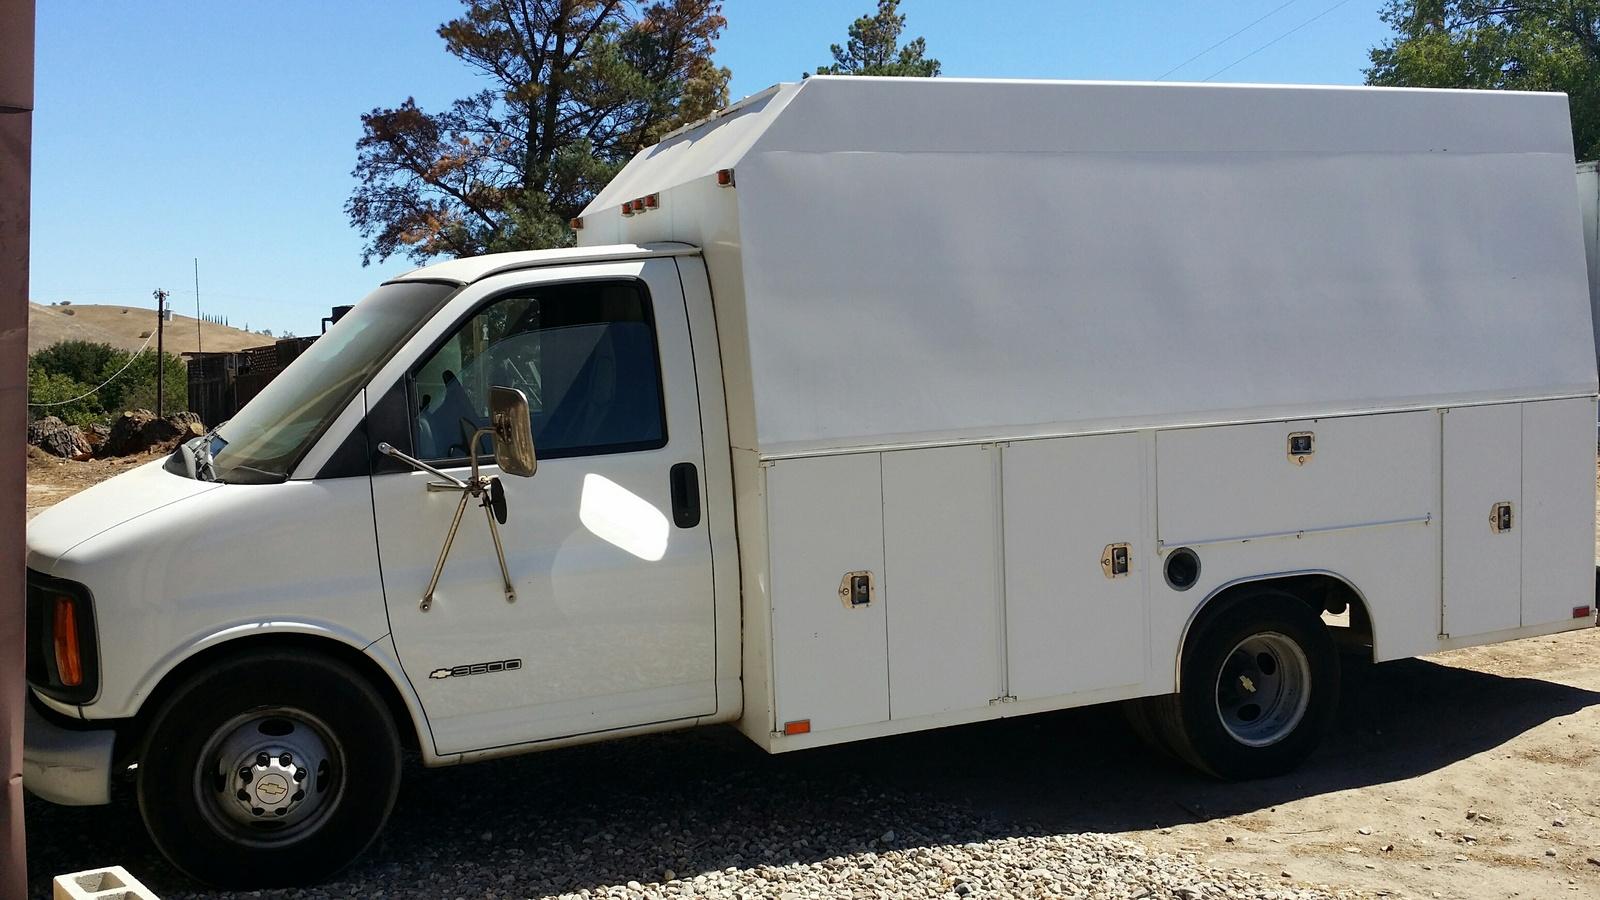 Chevrolet Express Cargo Questions - How do i list a car for sale ...